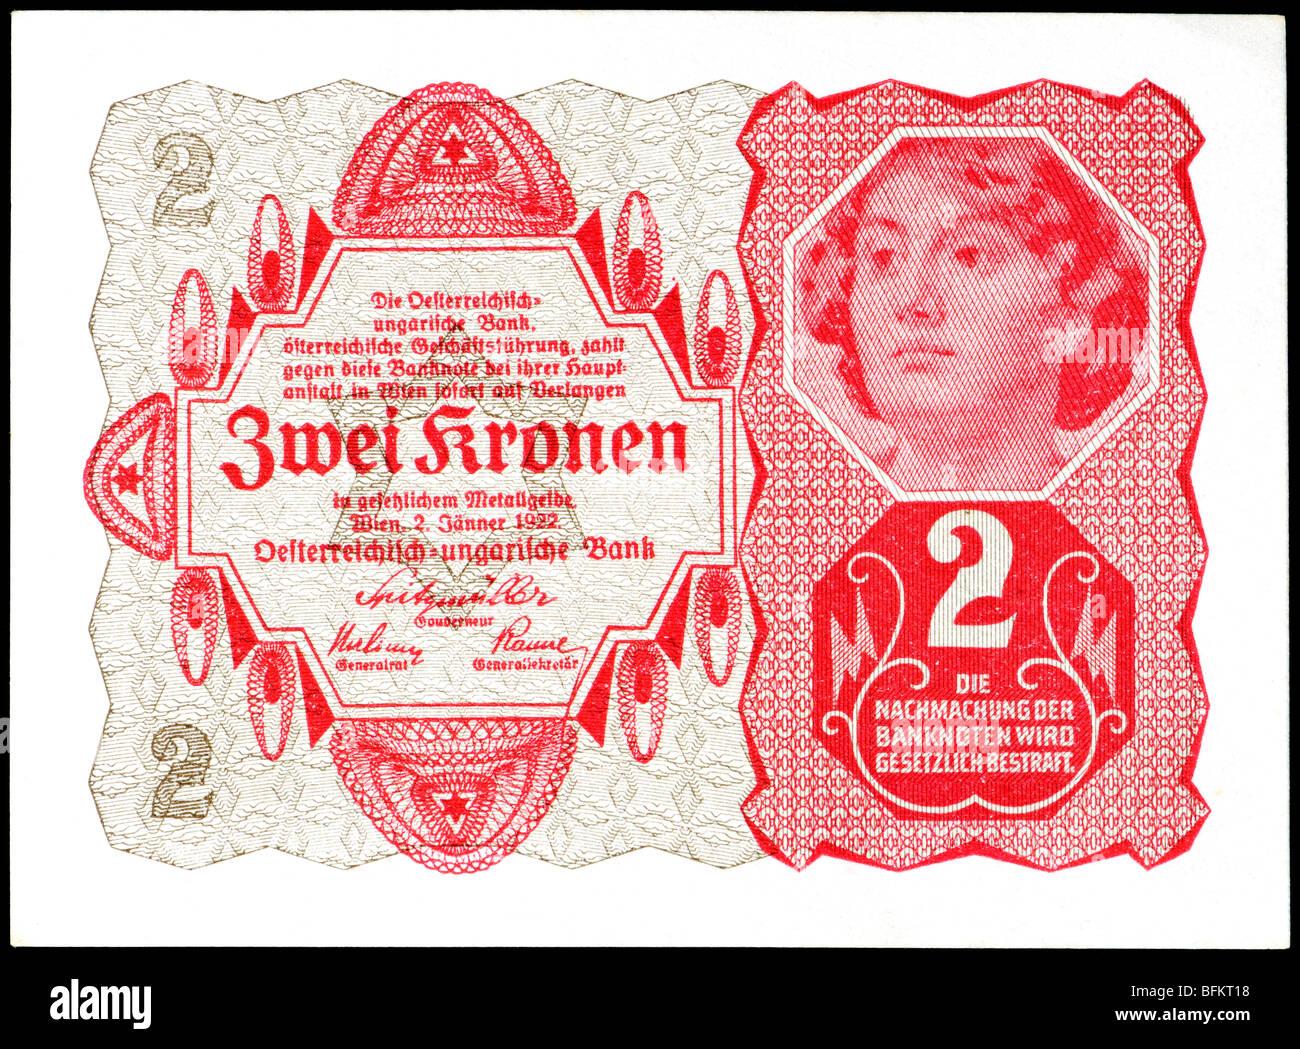 Austro-Hungarian Two Crown (Zwei Kronen) Banknote, Vienna, 1922. - Stock Image